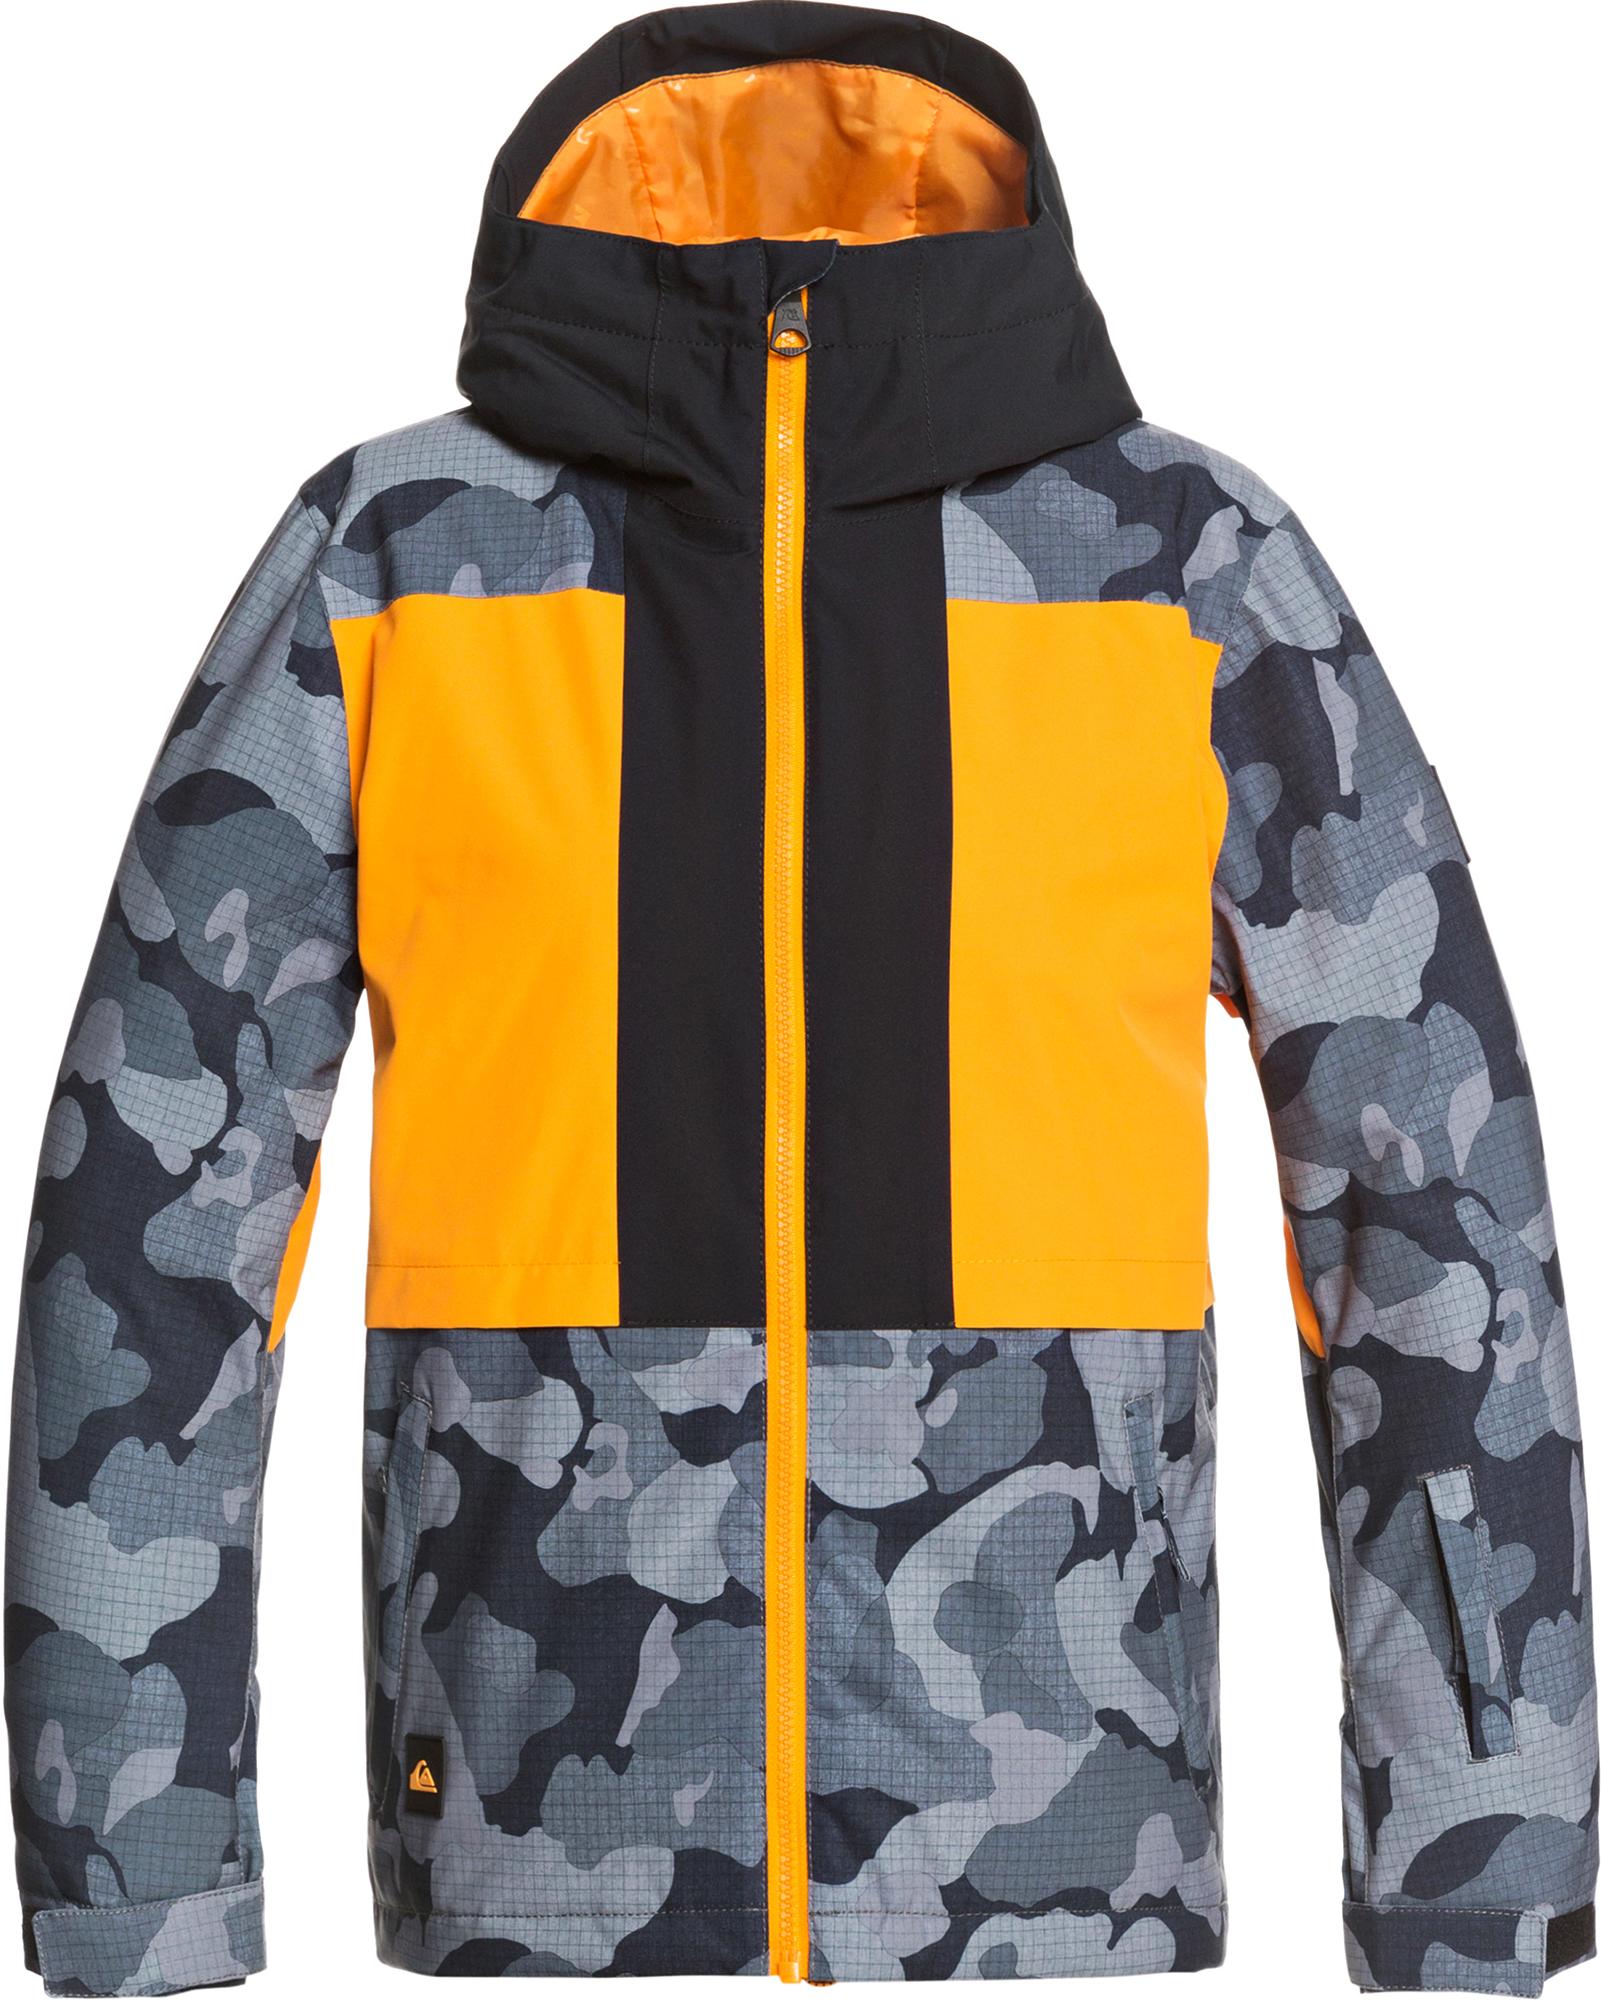 Quiksilver Куртка утепленная для мальчиков Quiksilver Groomer, размер 146-152